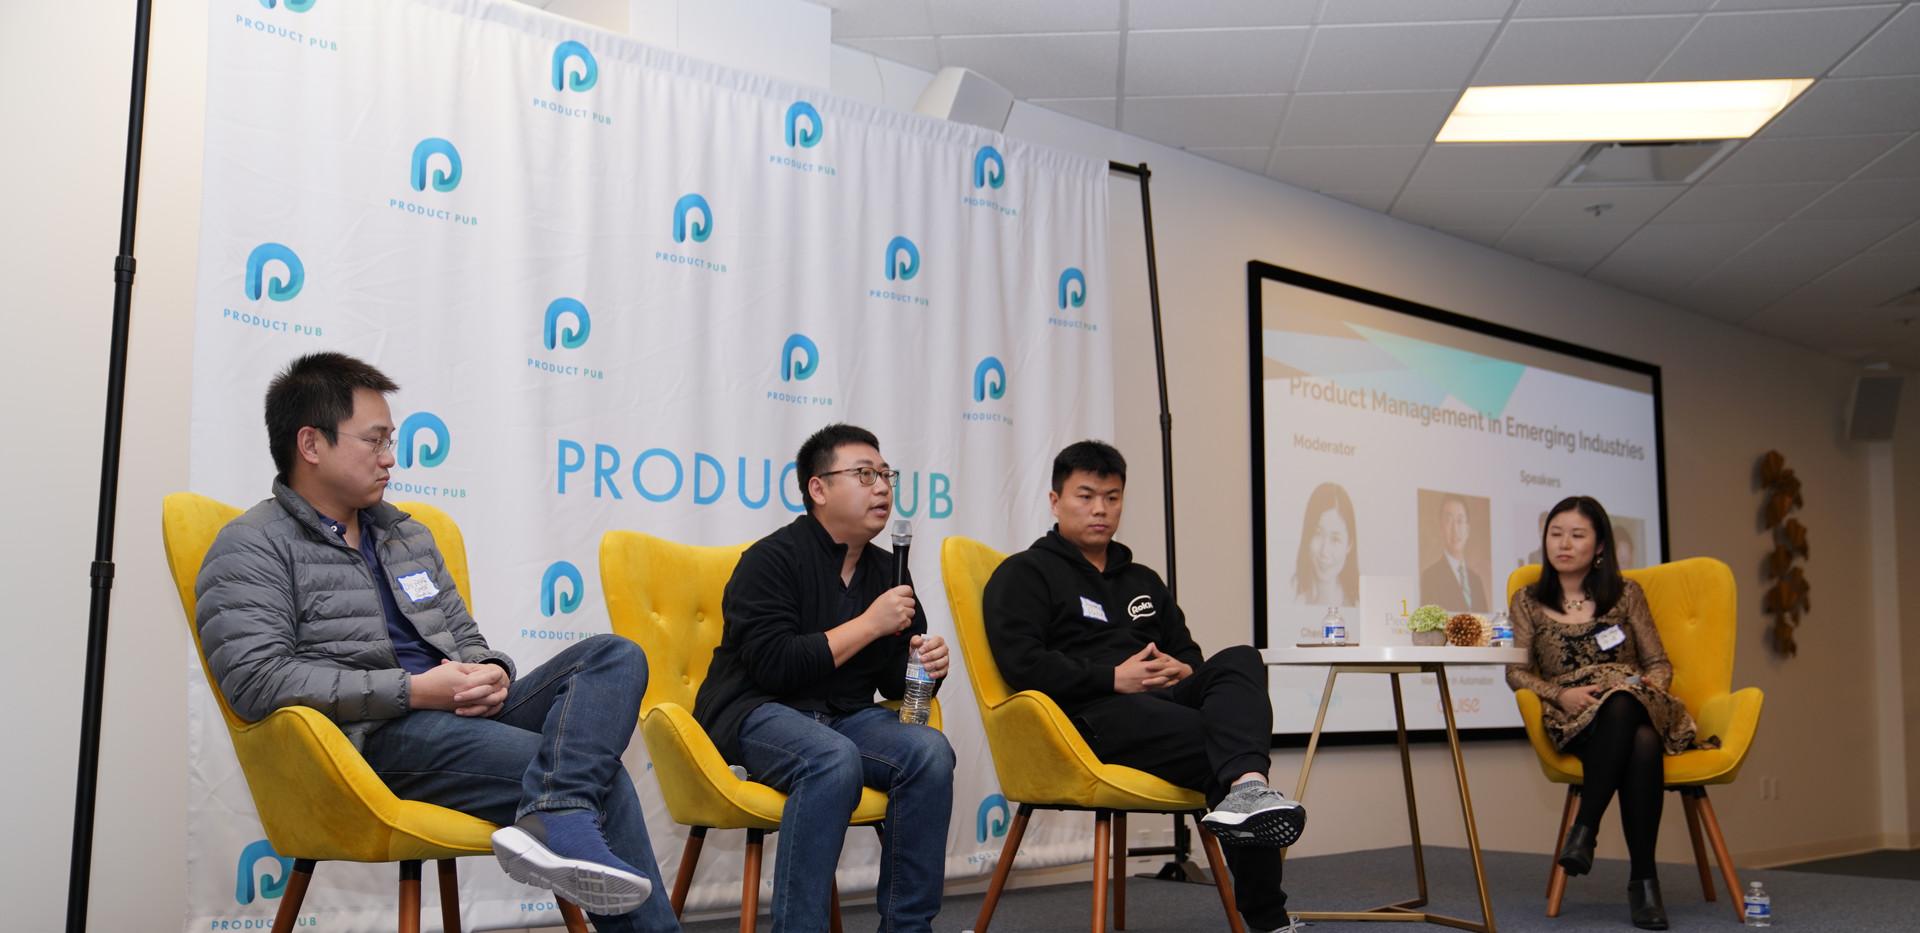 Product-Pub-Summit-2018-6